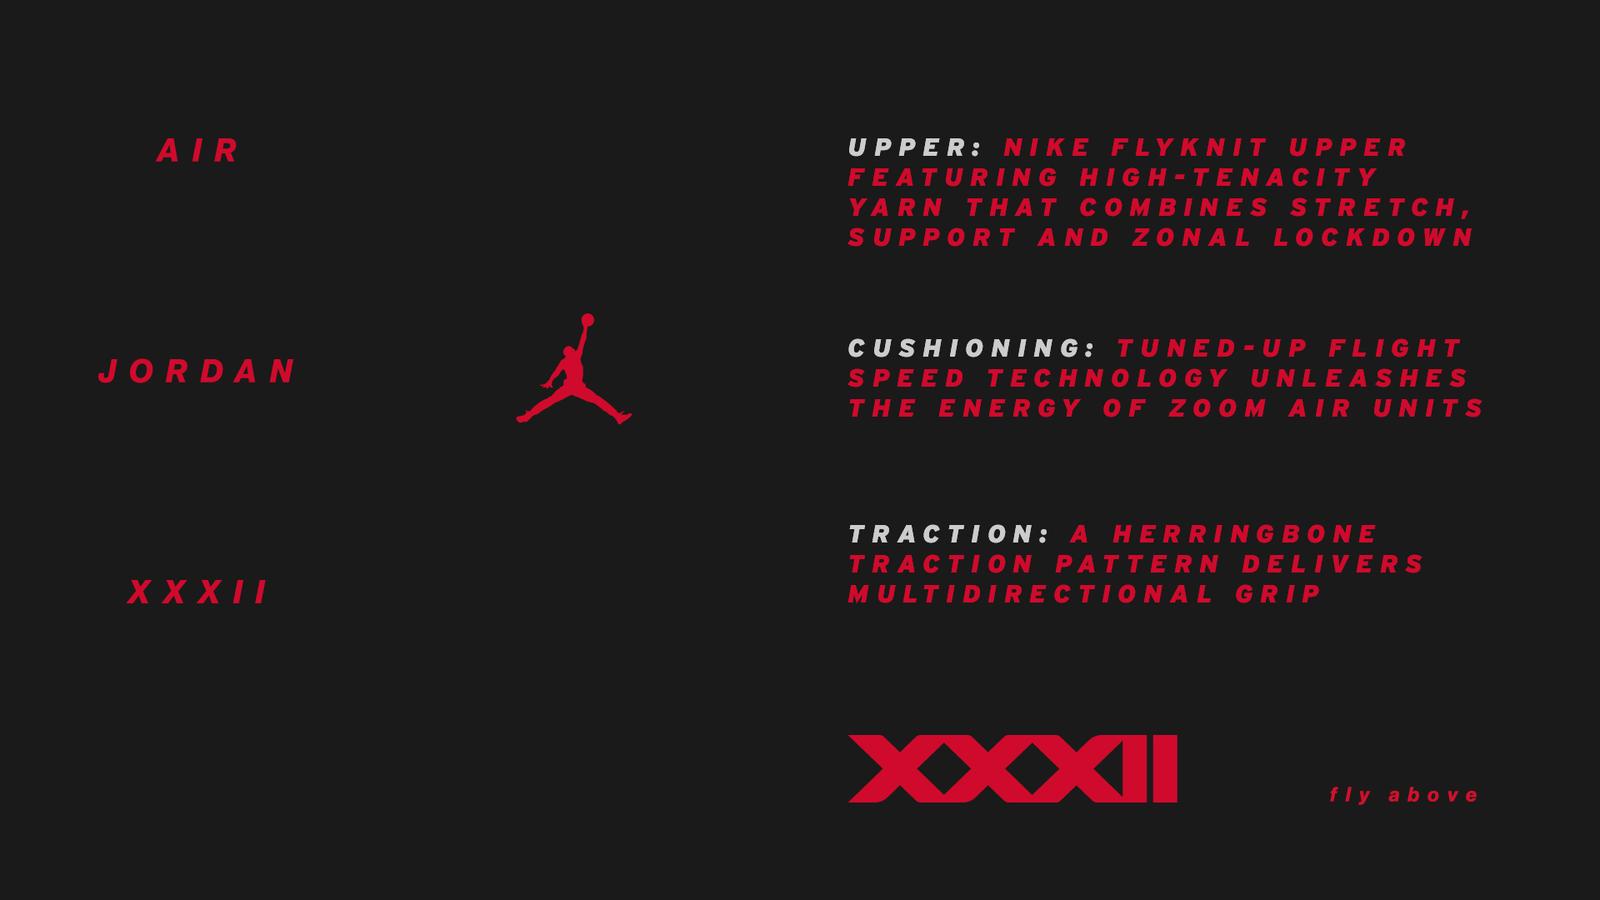 Introducing The Air Jordan Xxxii Nike News